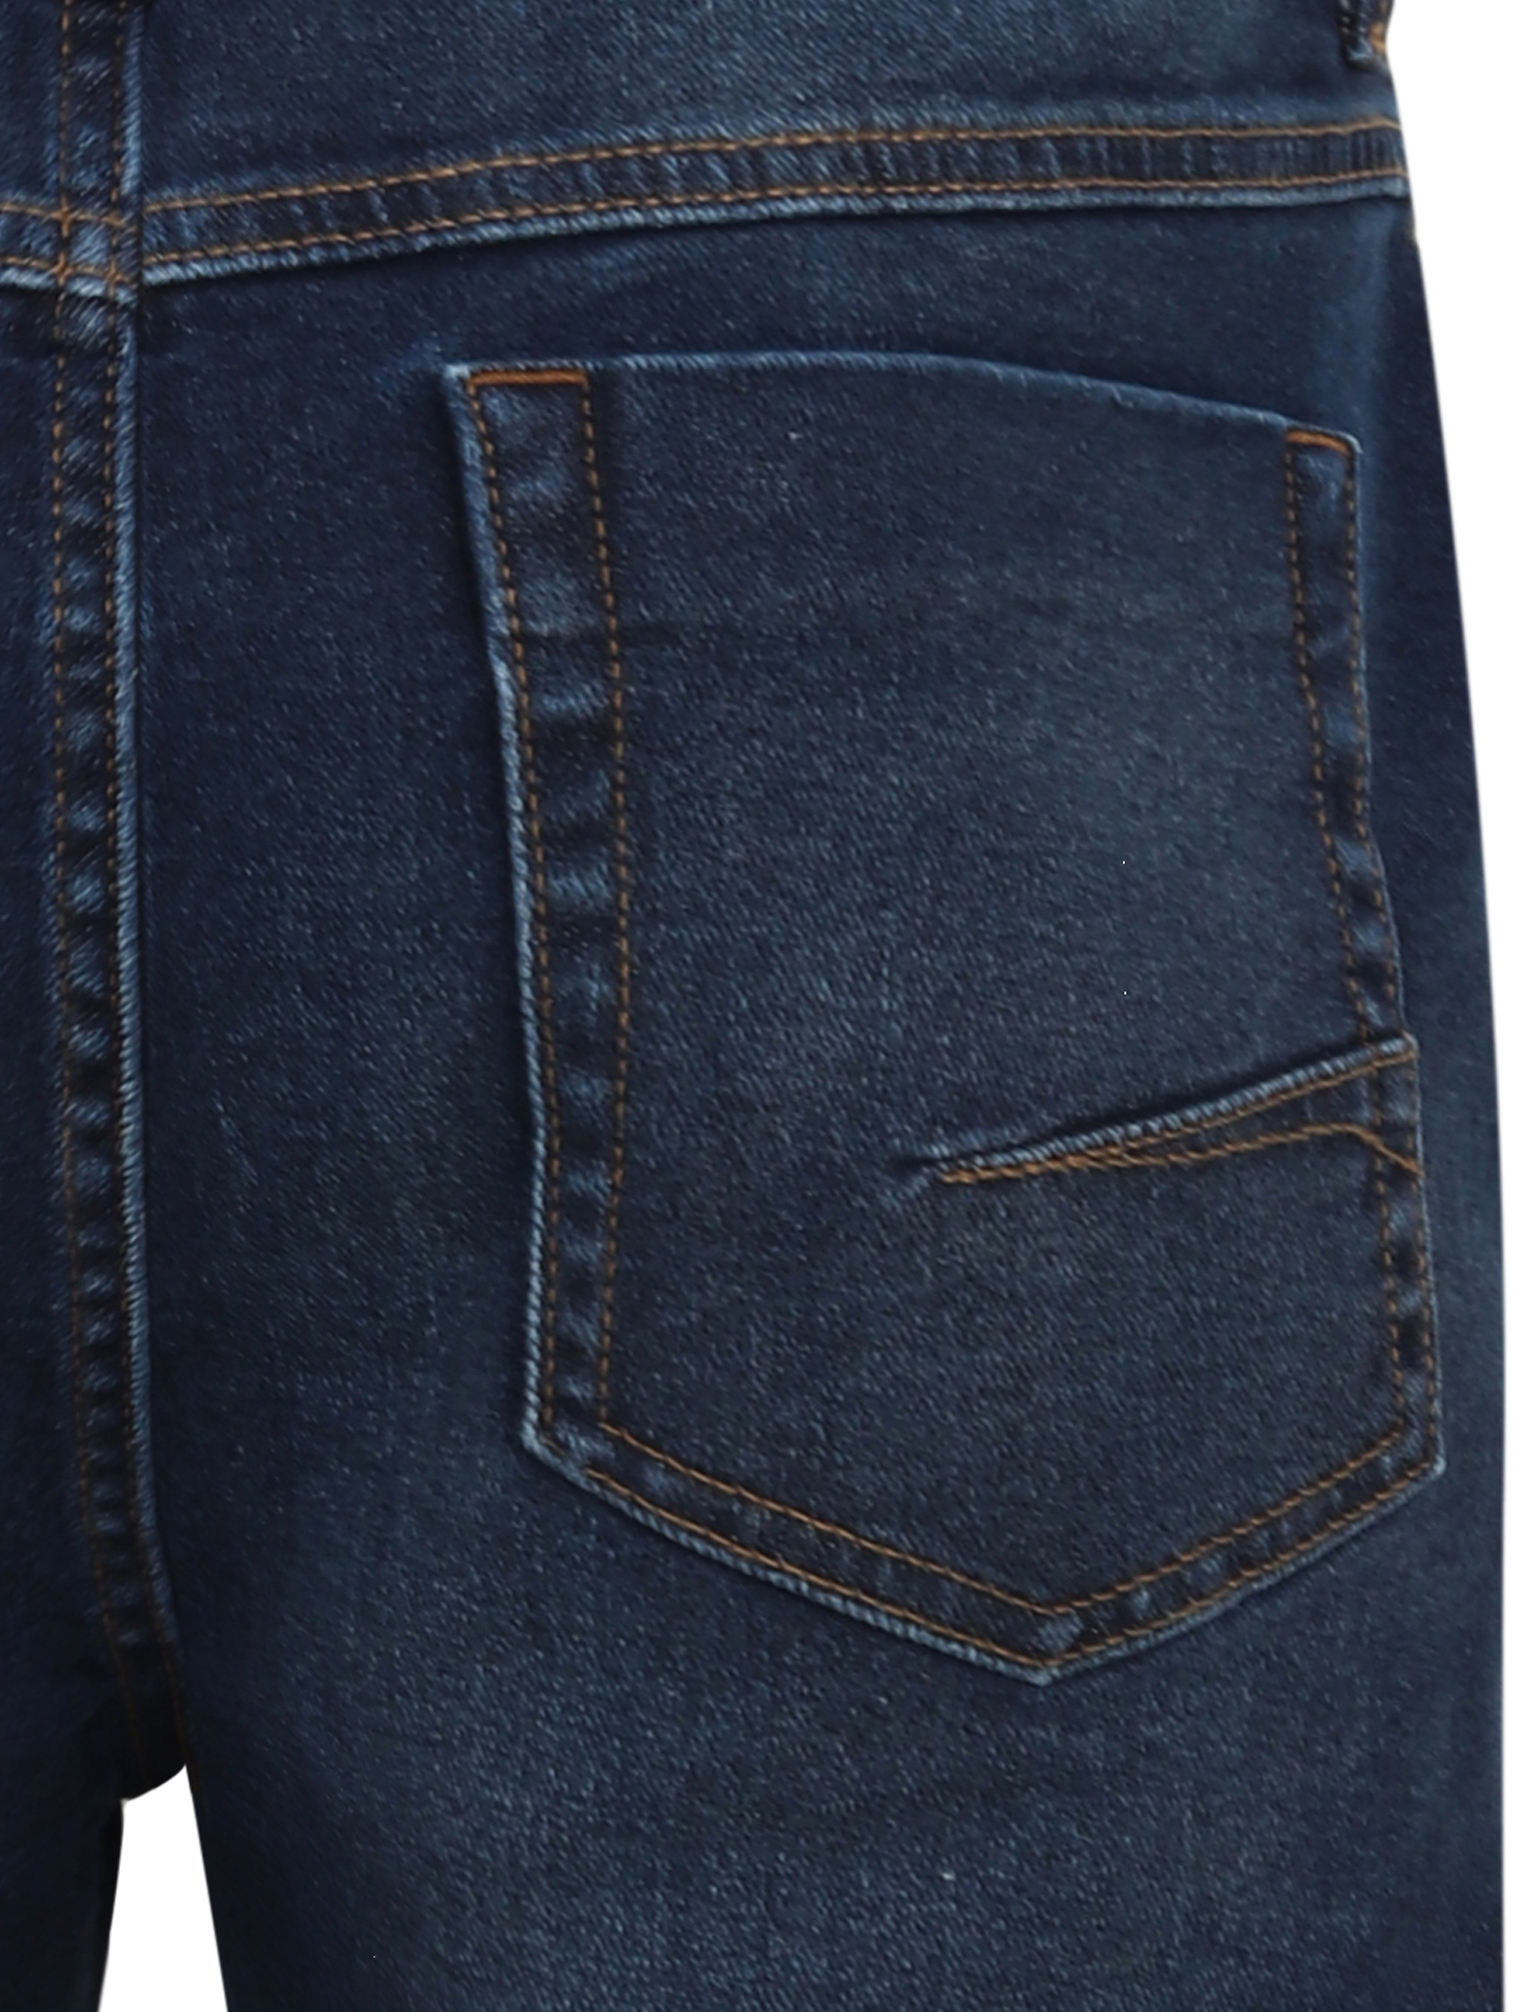 Tokyo-Laundry-Mens-Stretch-Denim-Shorts-Chino-Jean-Vintage-Dark-Light-Wash-Slim thumbnail 13